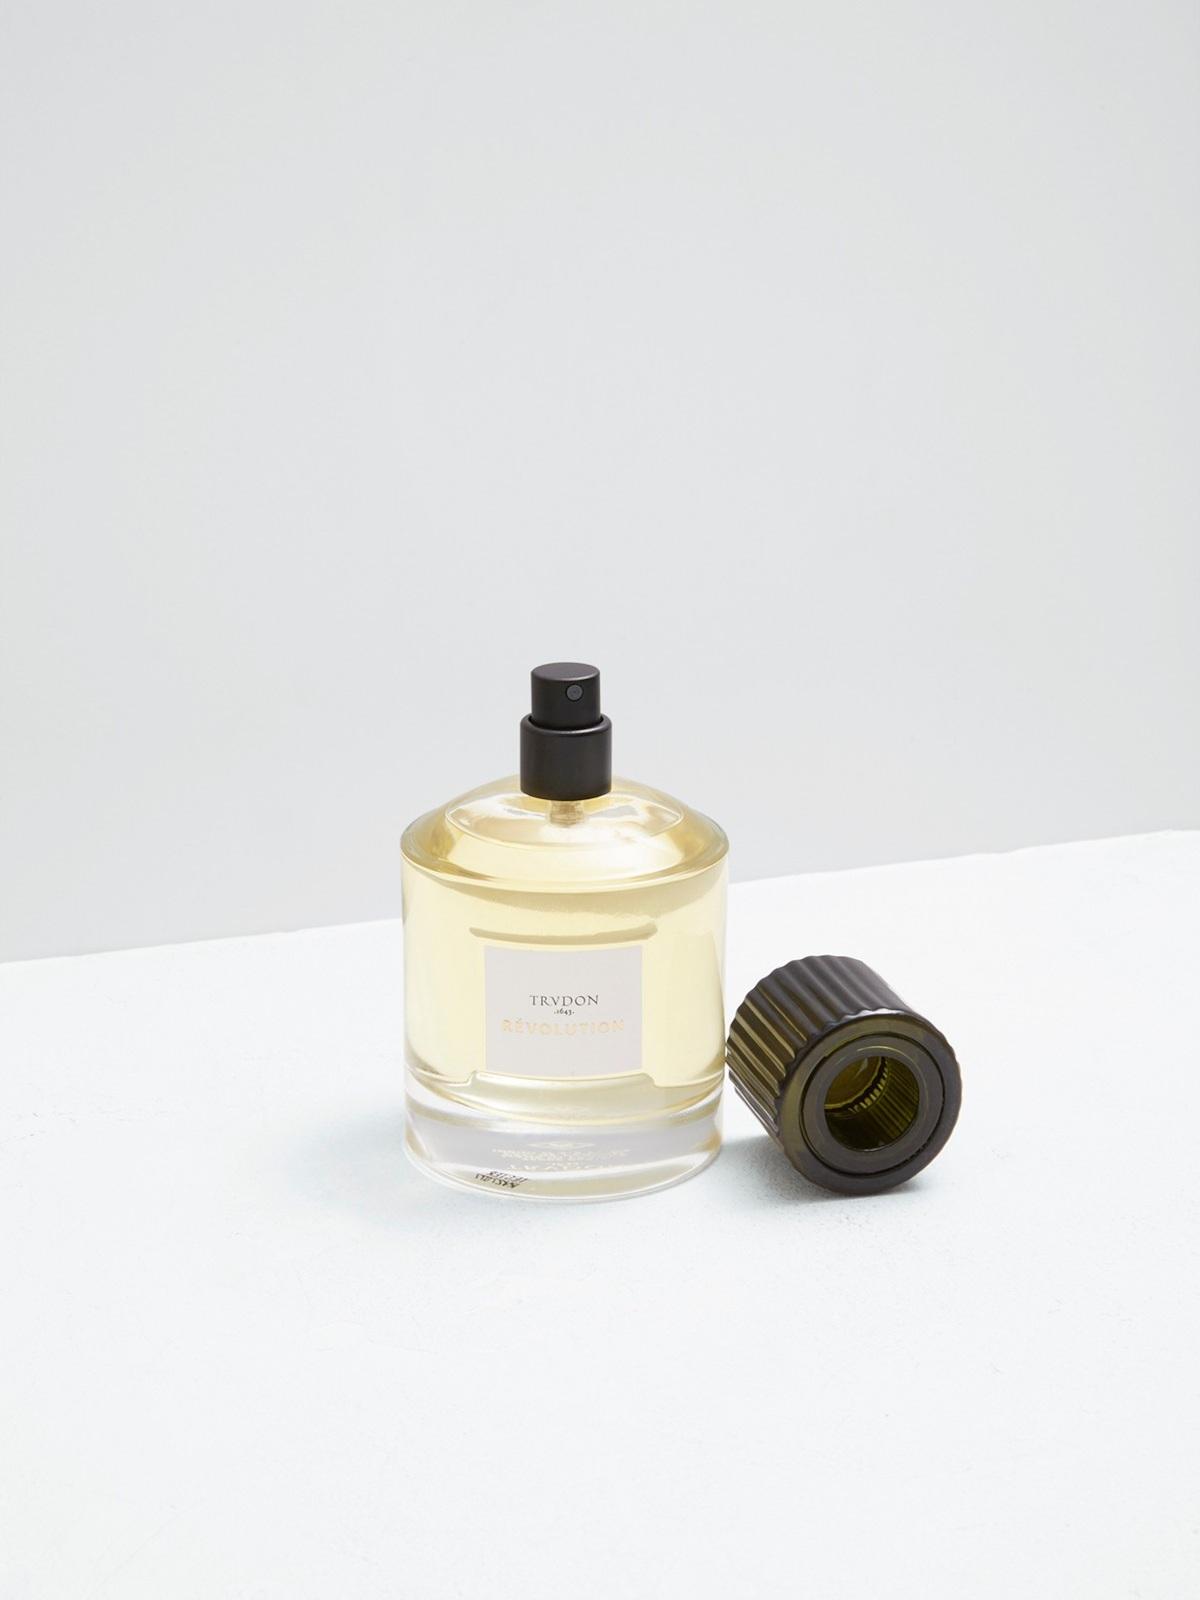 Cire-trudon-leparfum-Pauline+Deltour-01.jpg